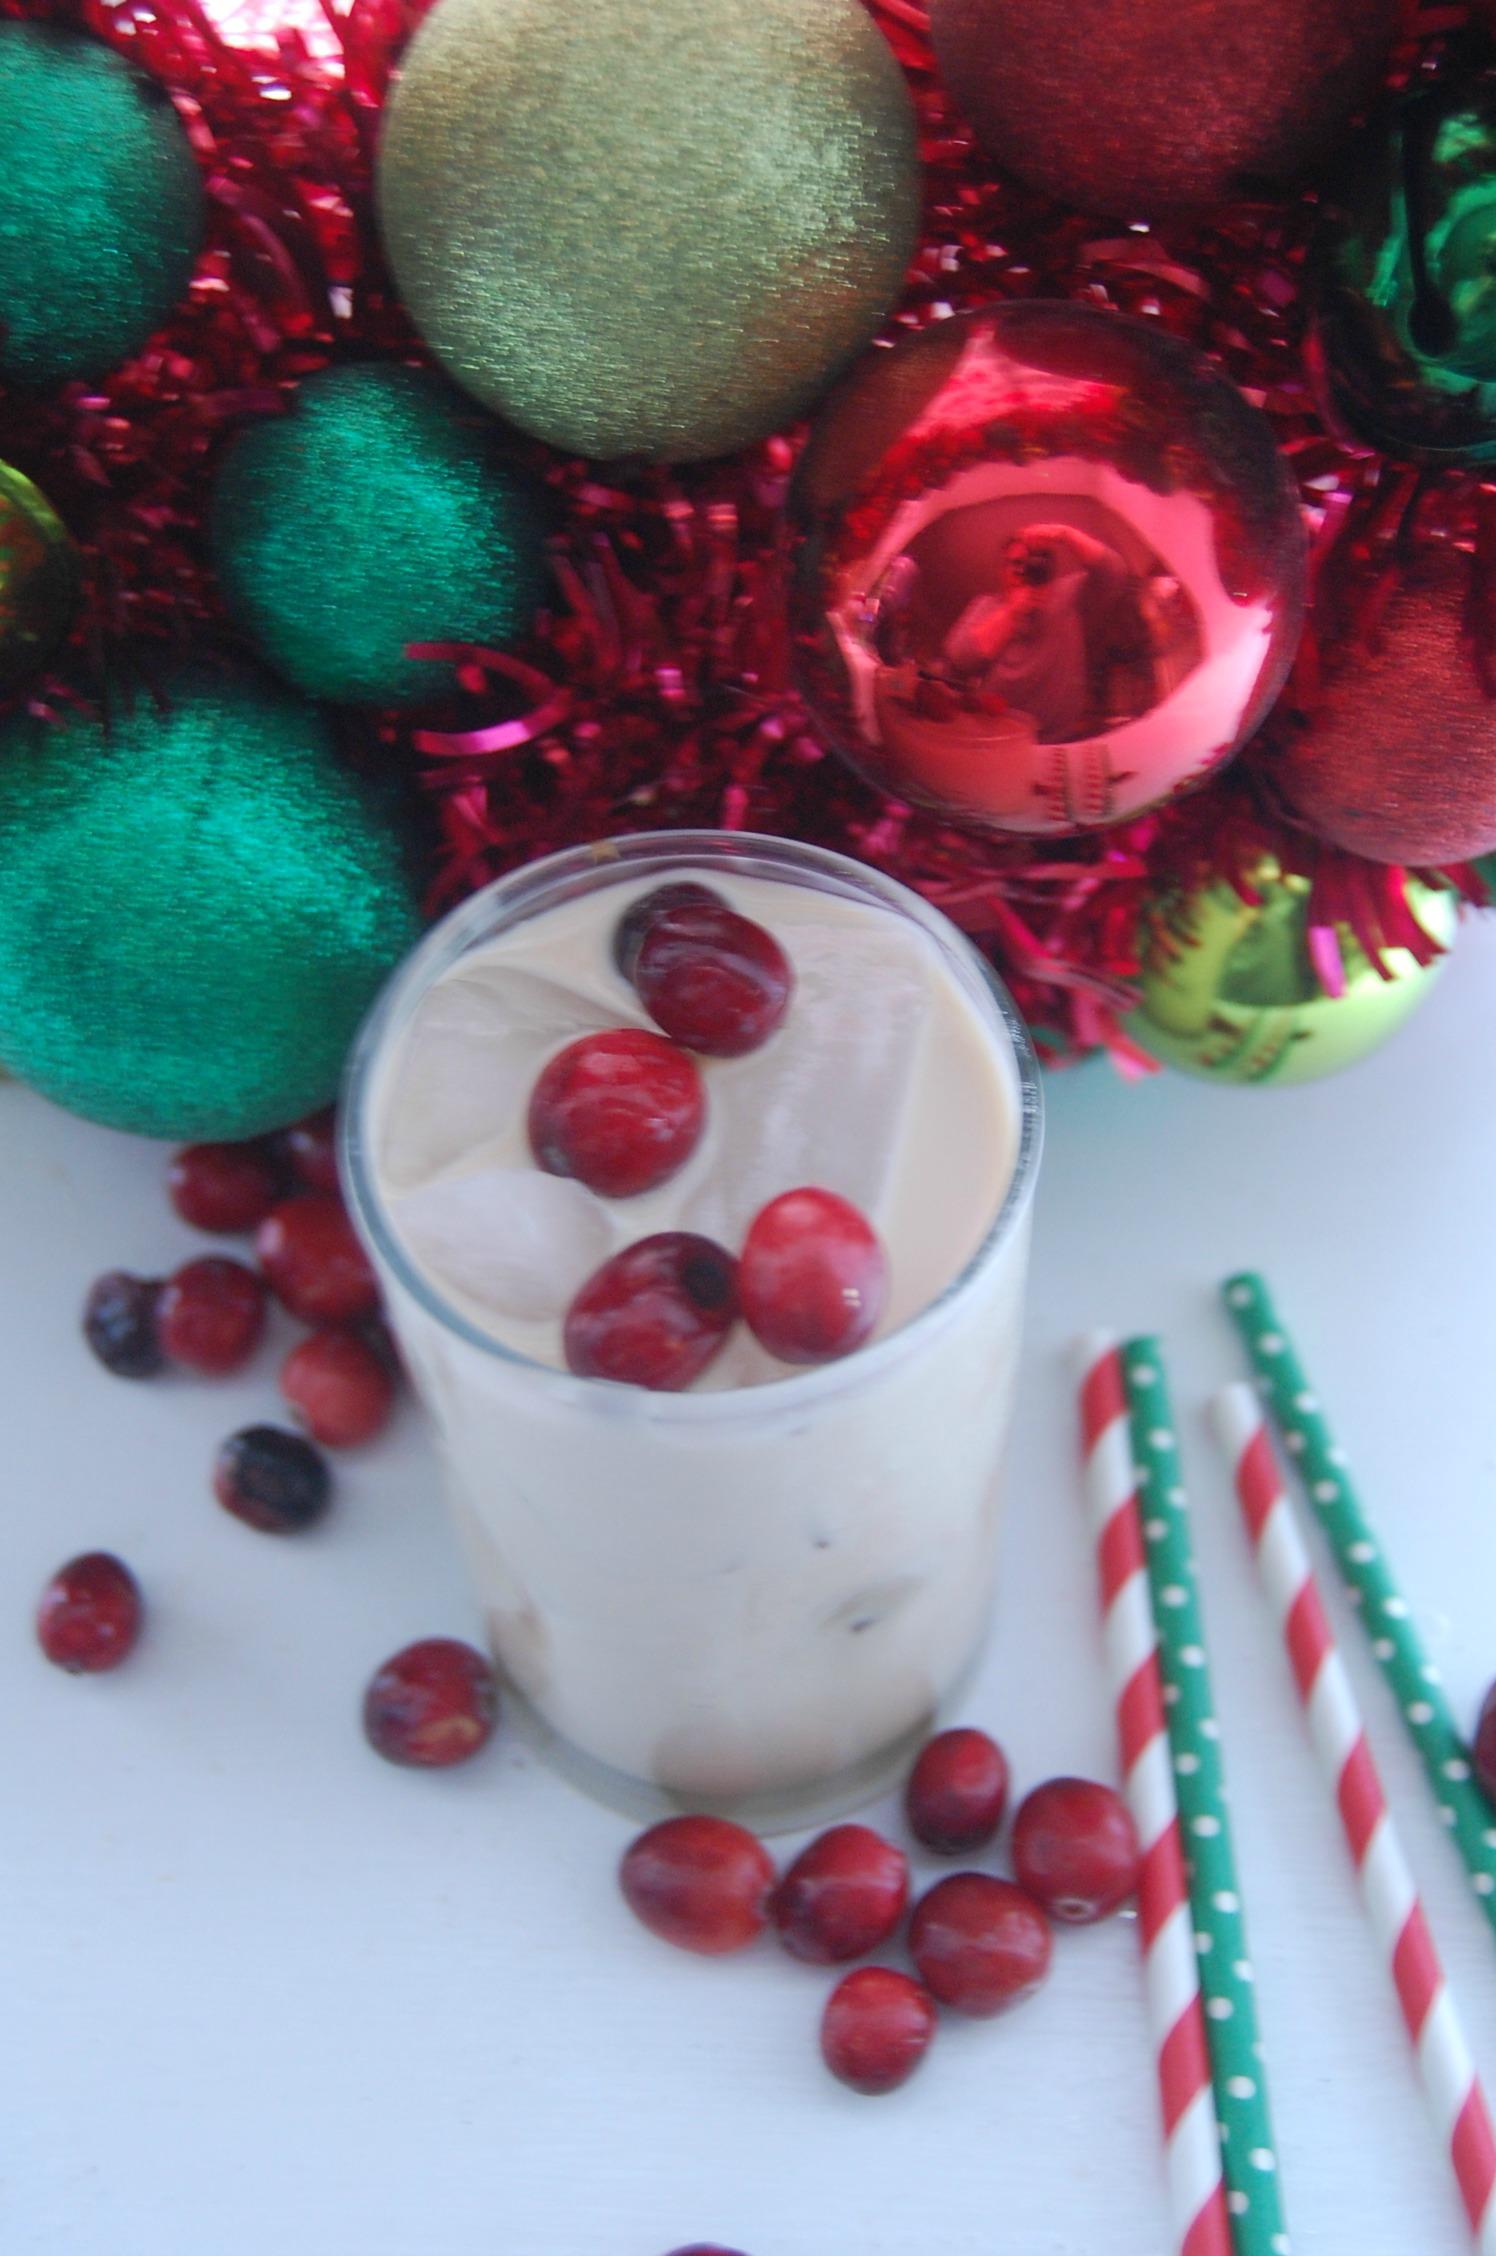 The Minty Santa Drink